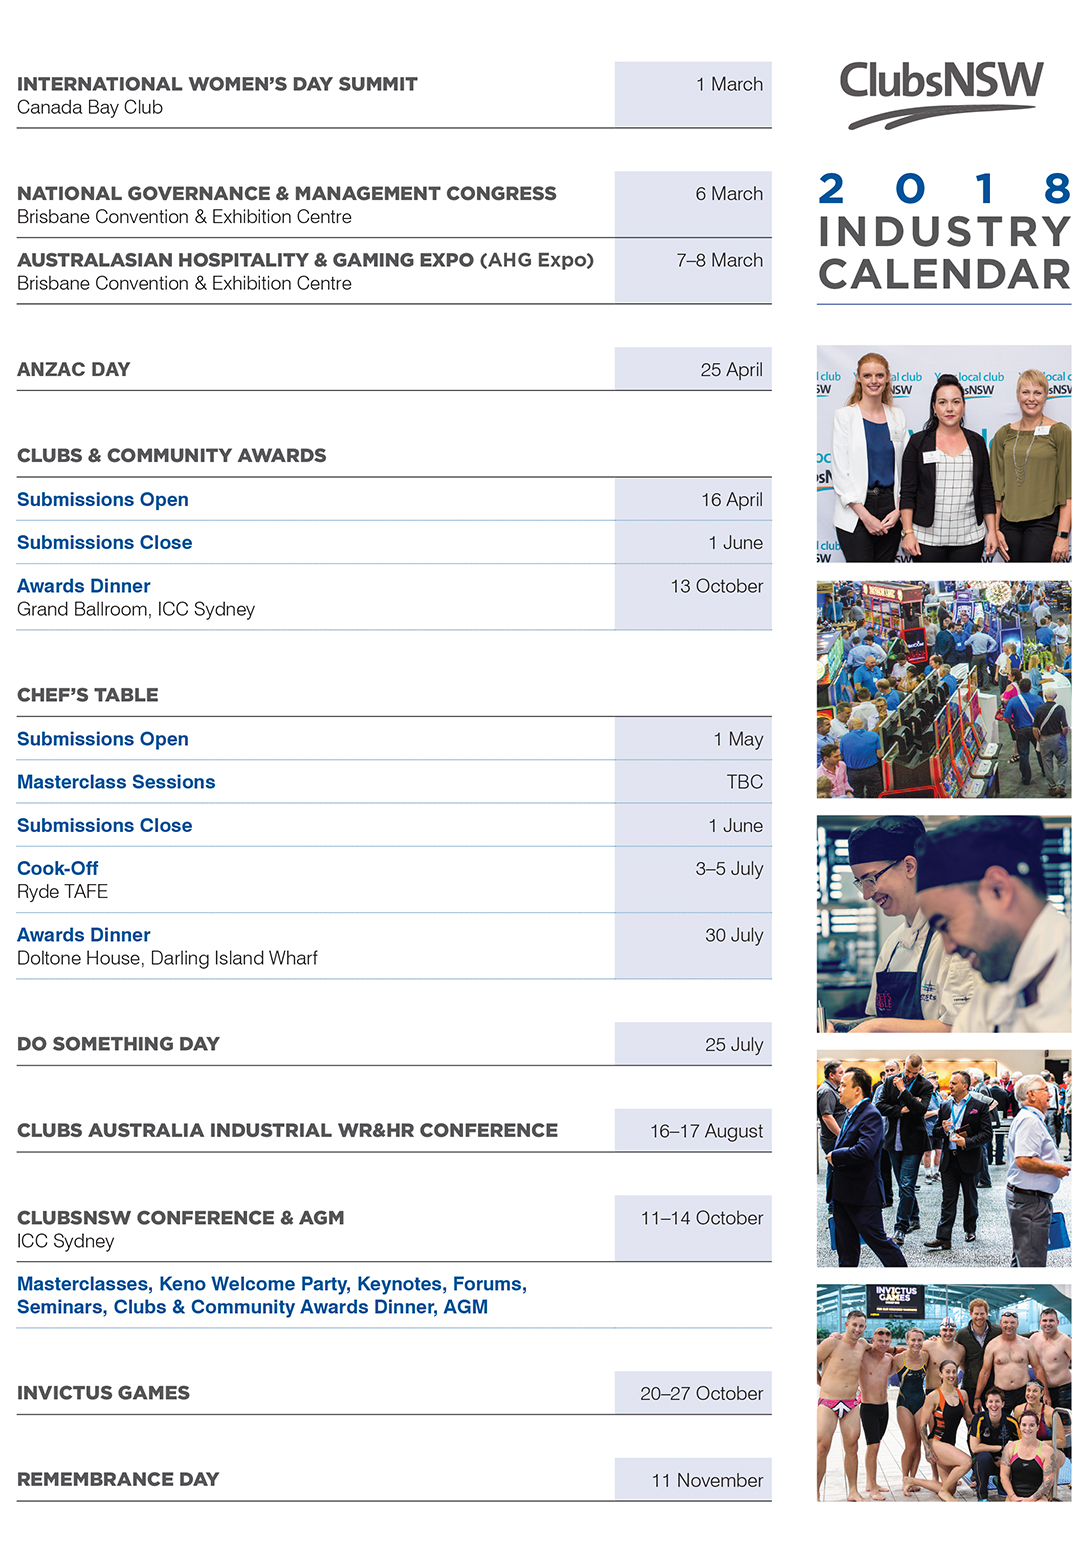 2018 Industry Calendar